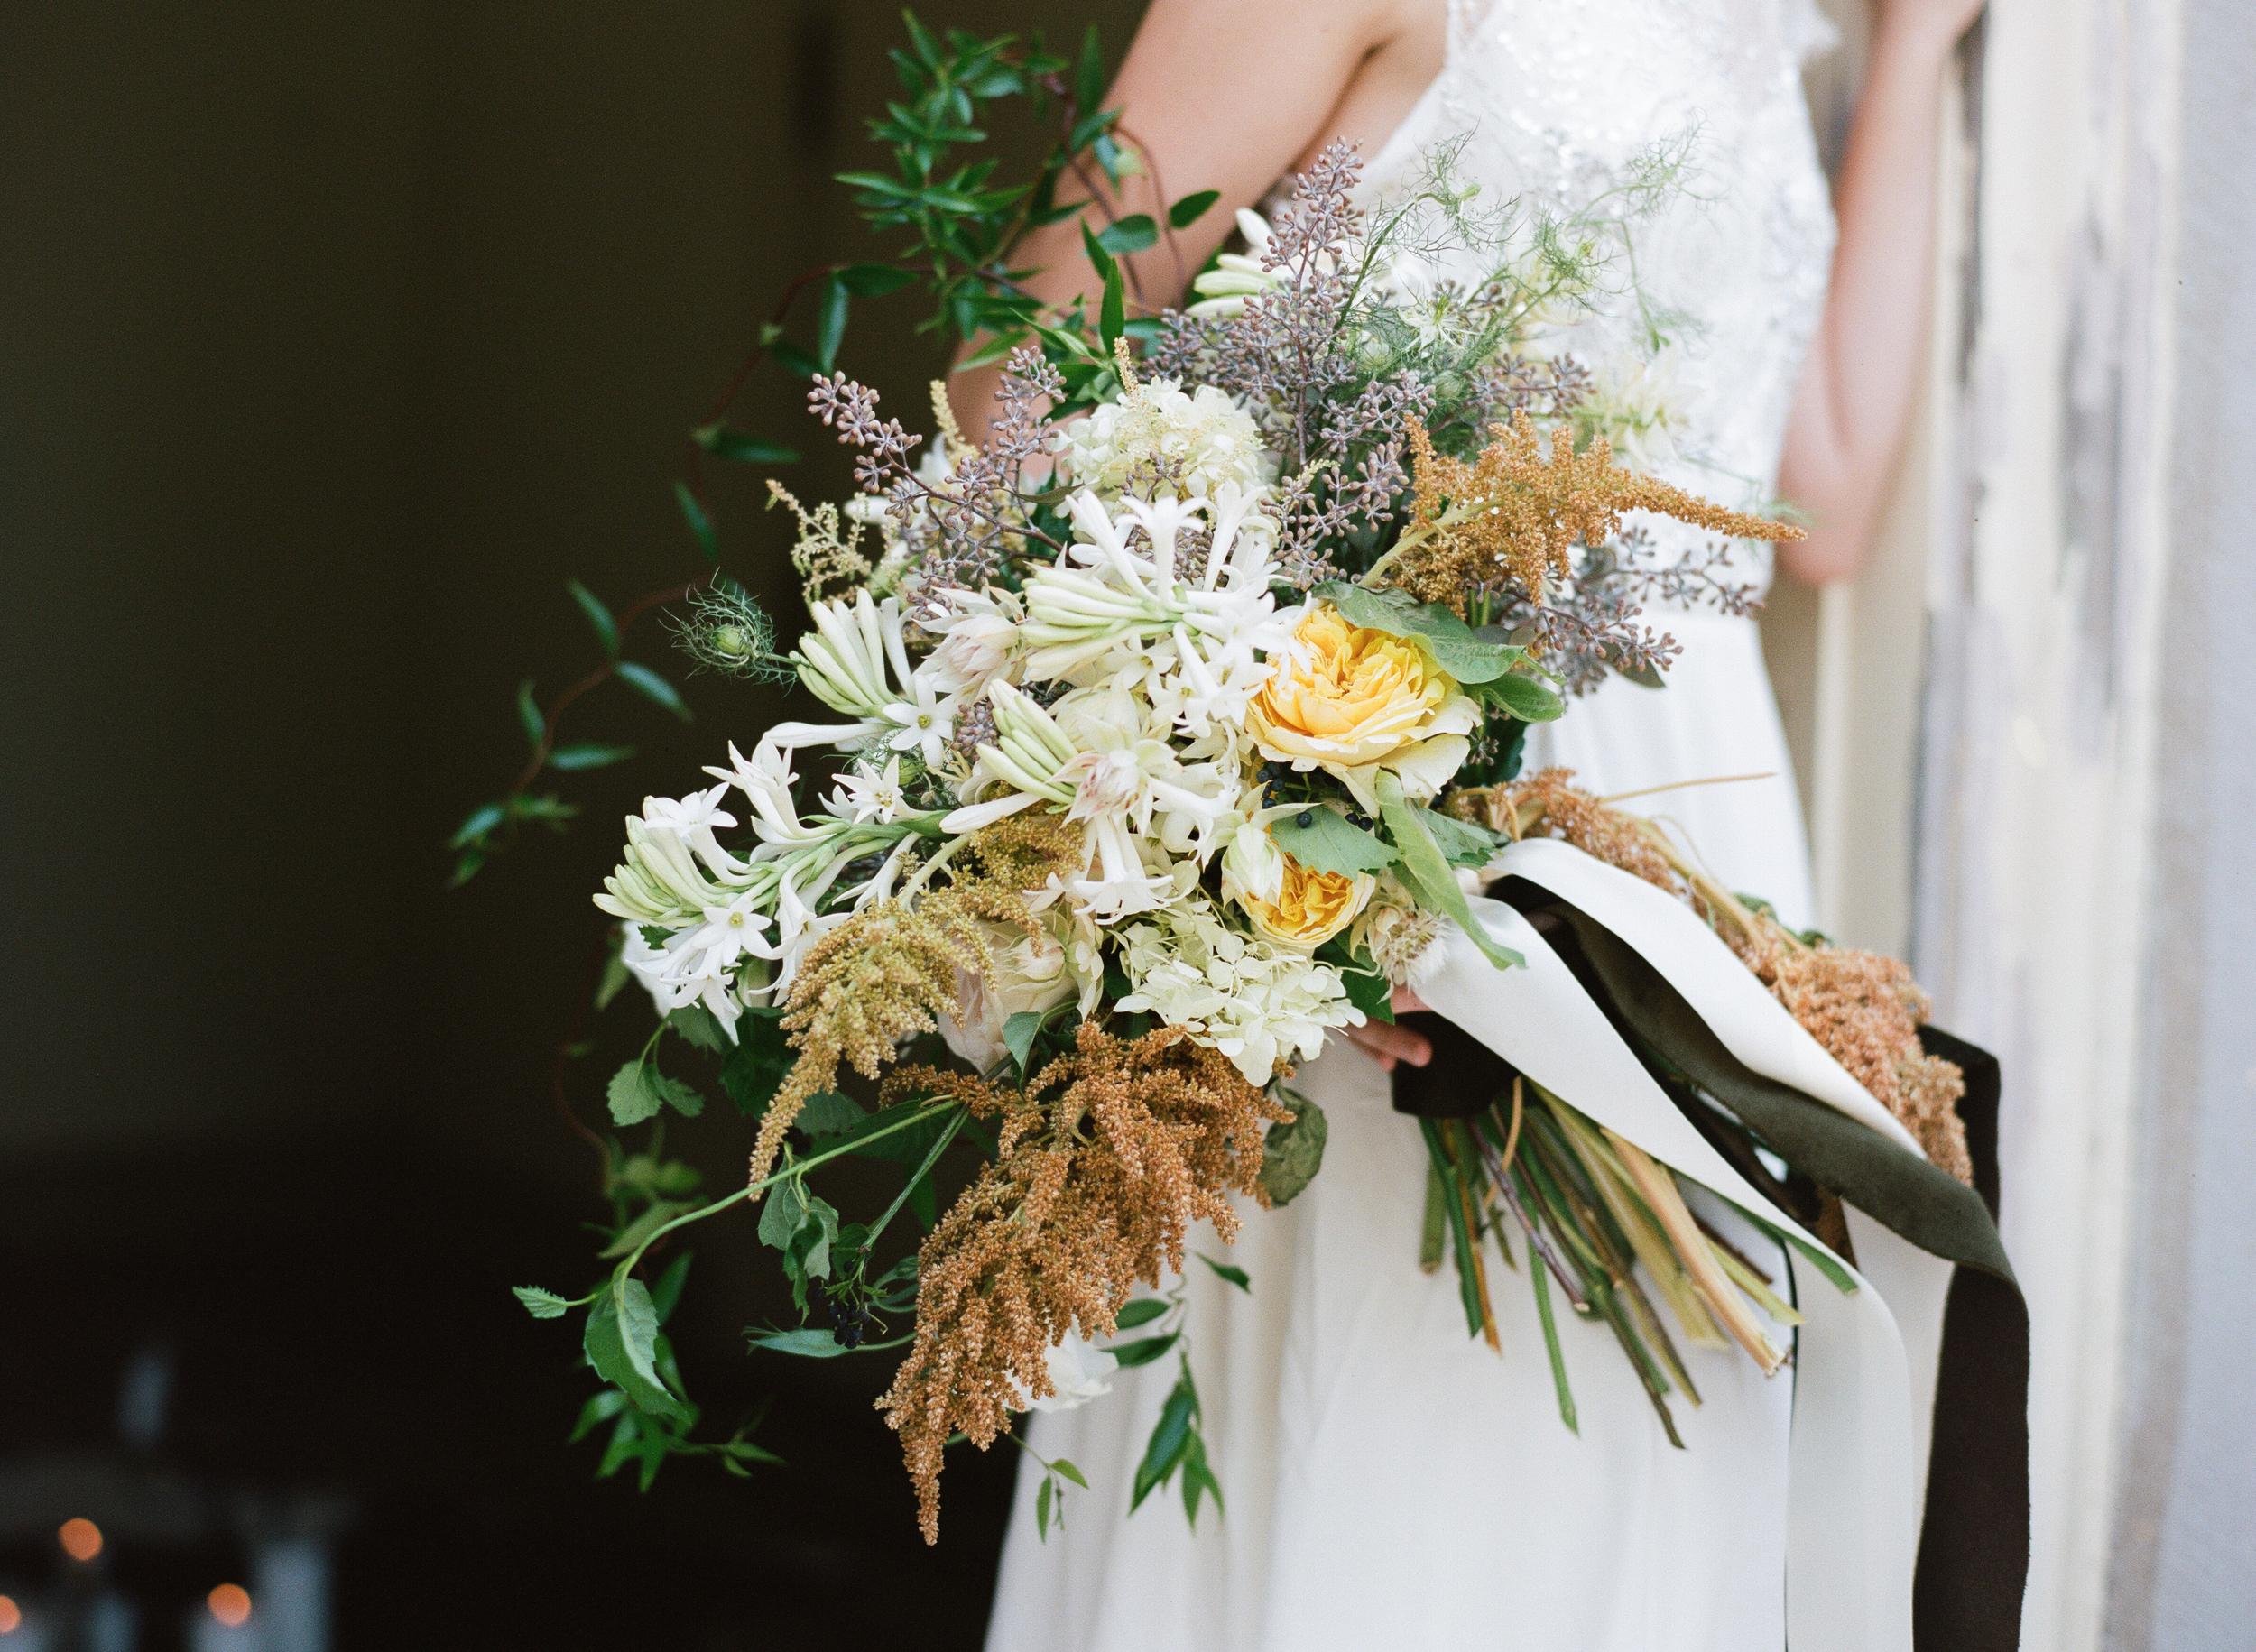 Olivia-Griffin-trendy-bride-magazine-willow-florals-sarah-seven-gwen-ivory-and-beau-bridal-boutique-savannah-wedding-dresses-savannah-bridal-boutique-savannah-wedding-savannah-bridal-gowns-savannah-wedding-planner-georgia-bridal-boutique-7.JPG